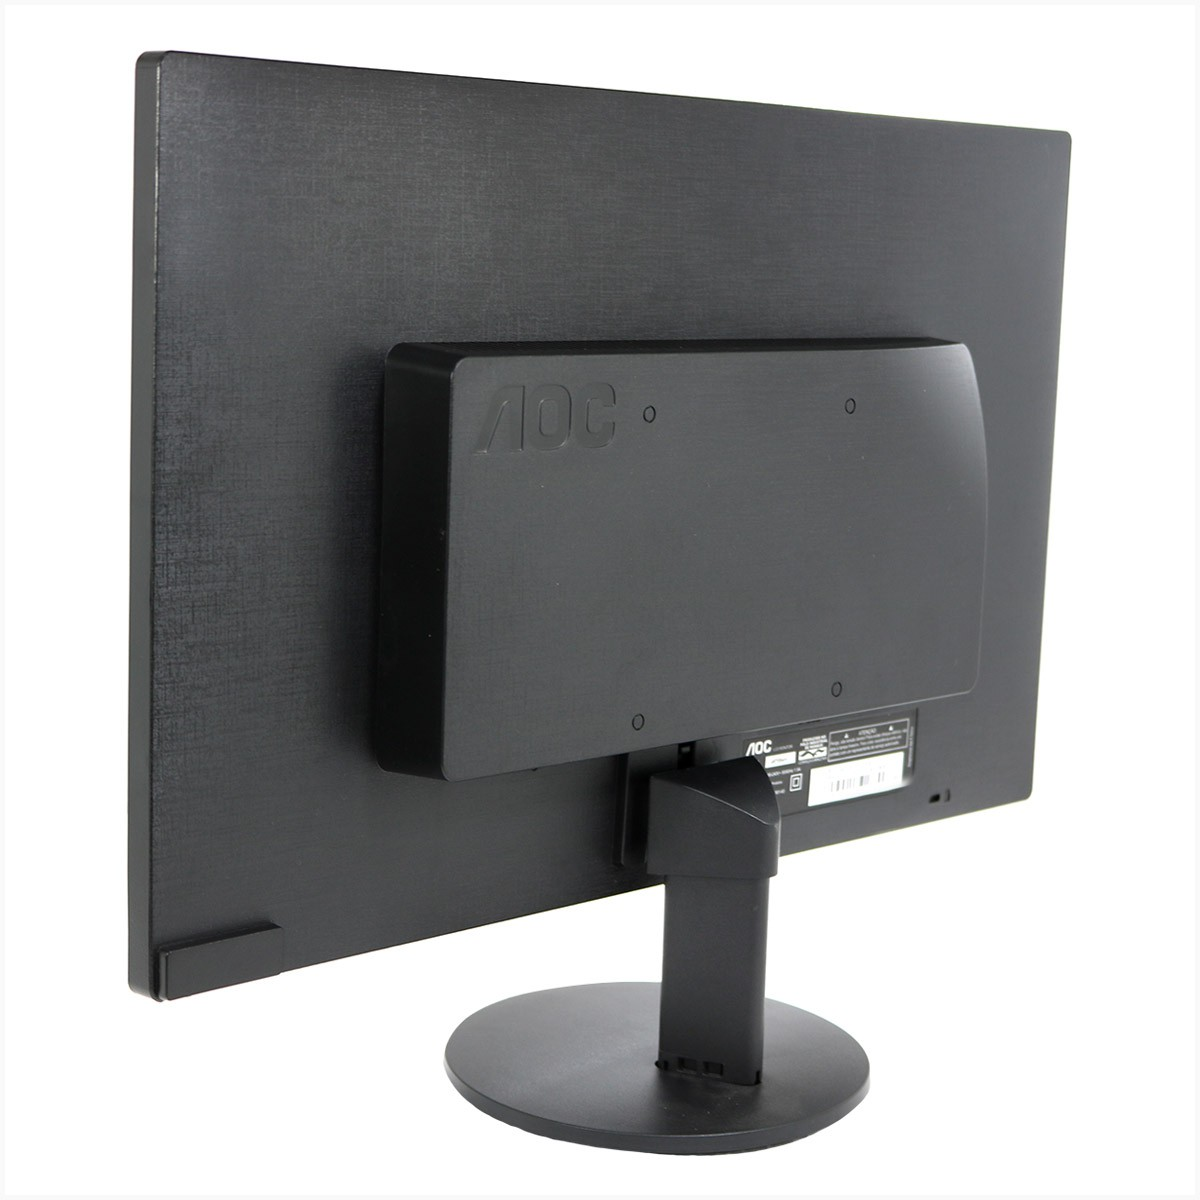 "Monitor AOC E970 SWNL 18"" - Usado"